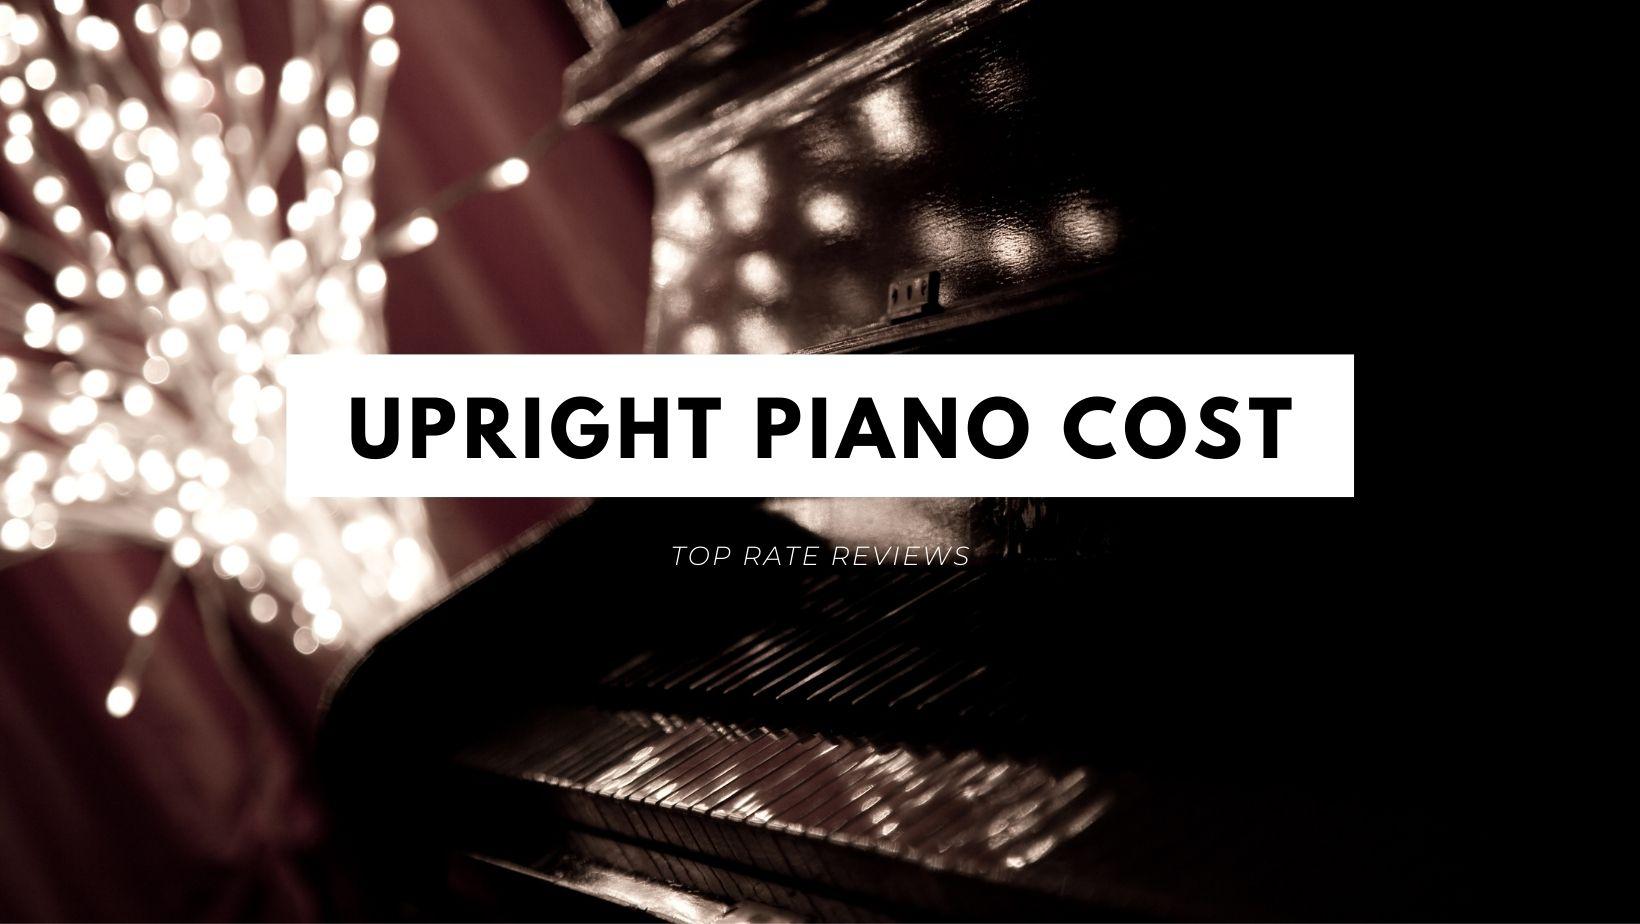 Upright Piano Cost